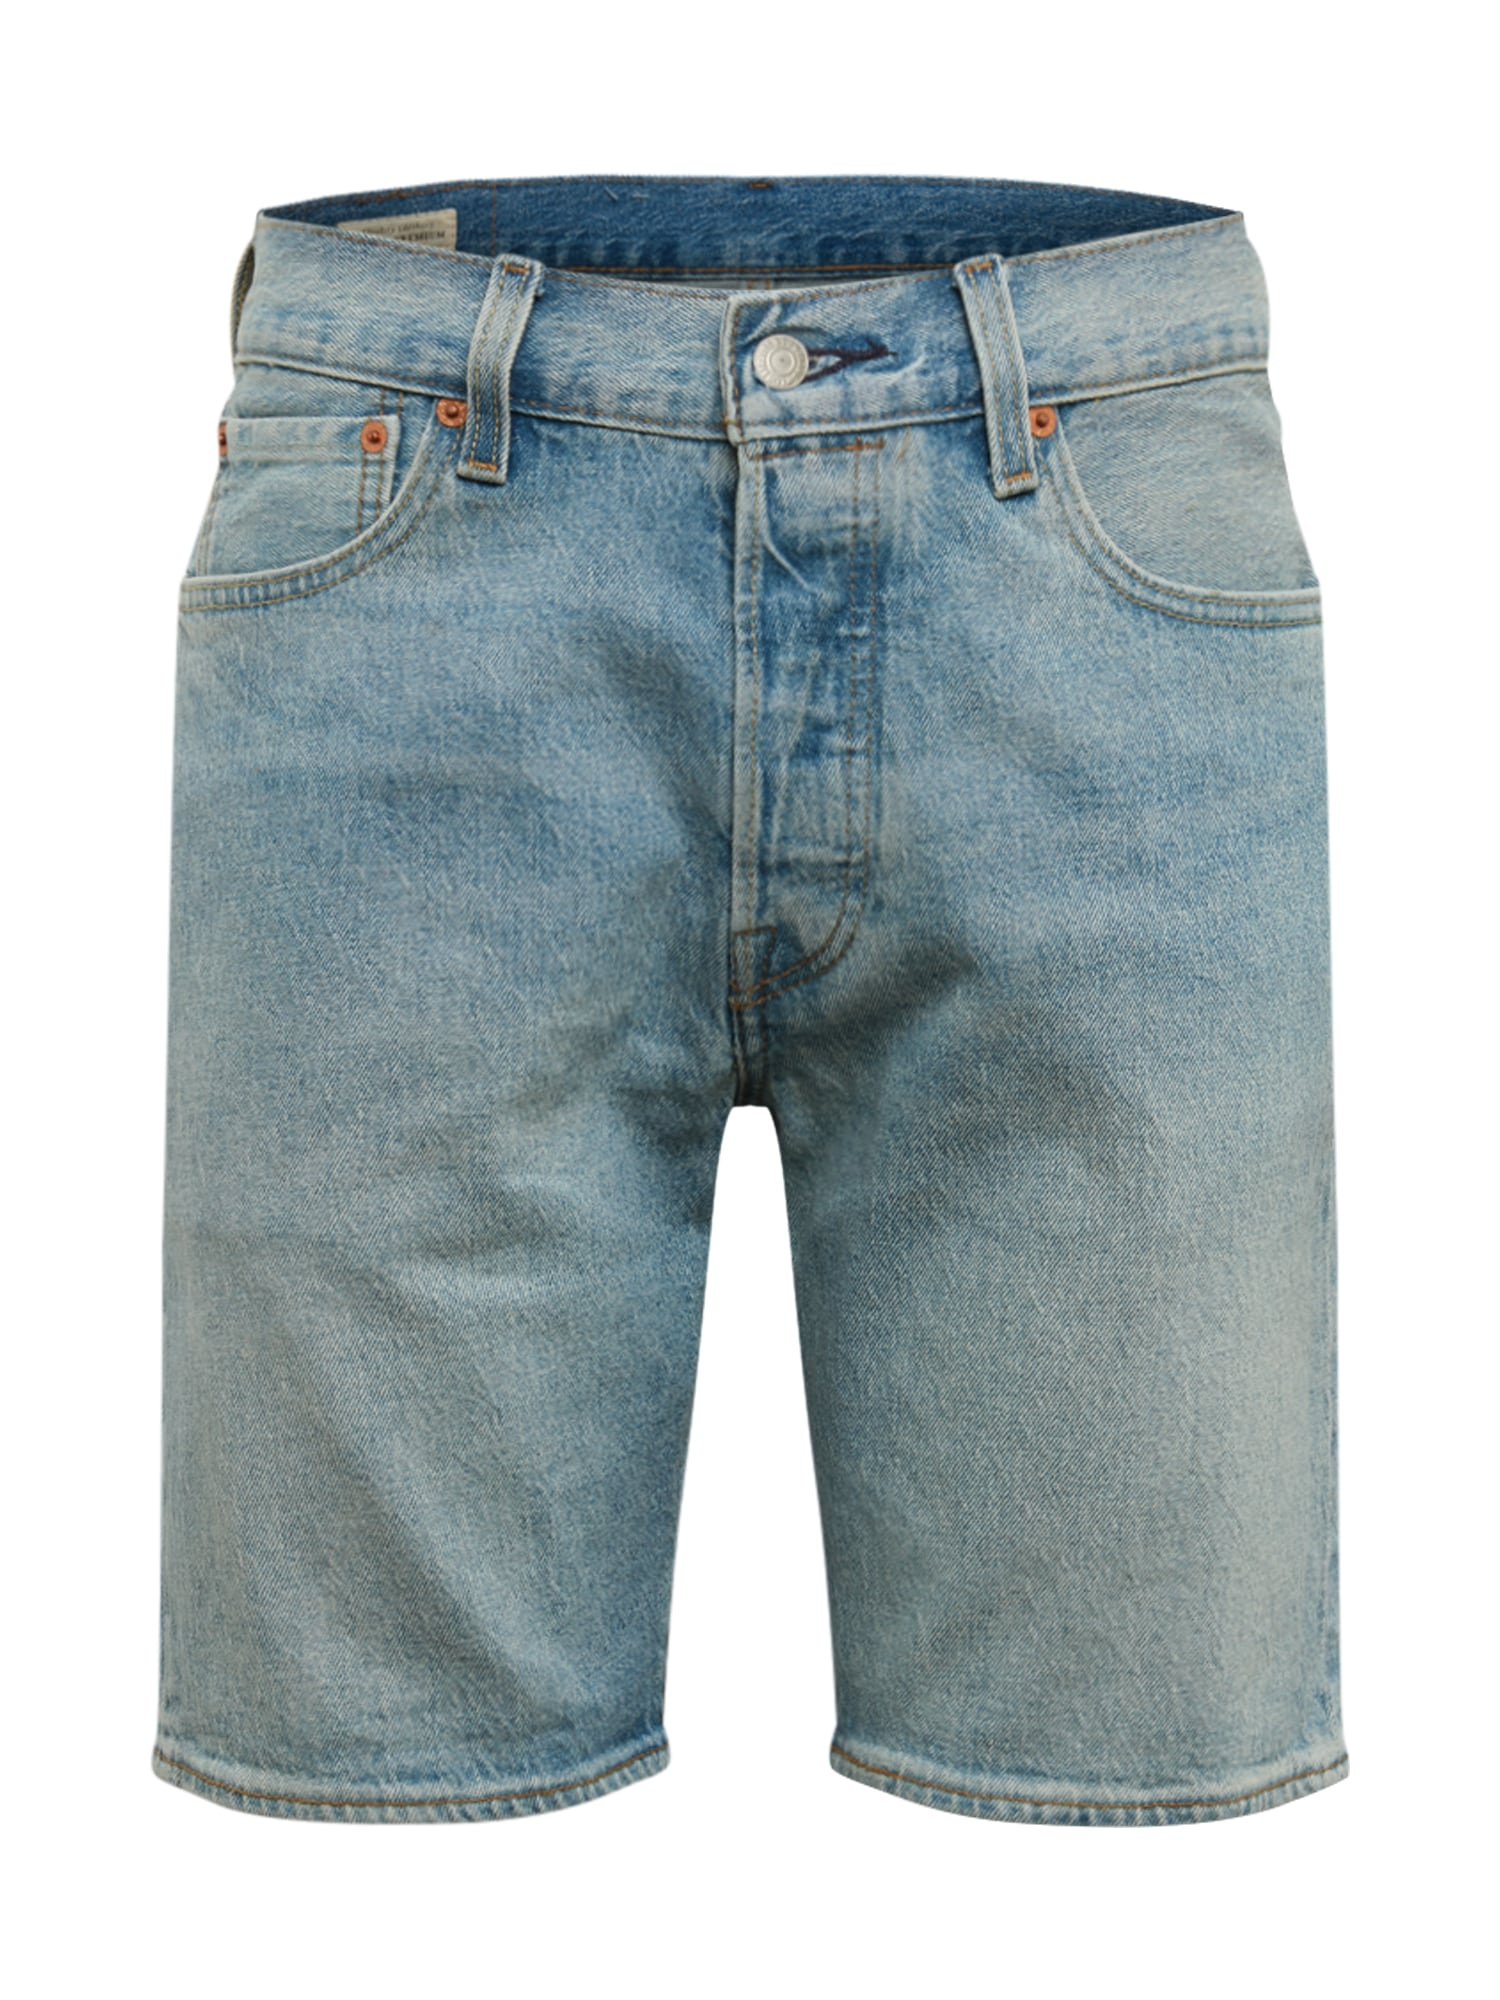 LEVI'S Džinsai 'LEVI'S 501® ' tamsiai (džinso) mėlyna